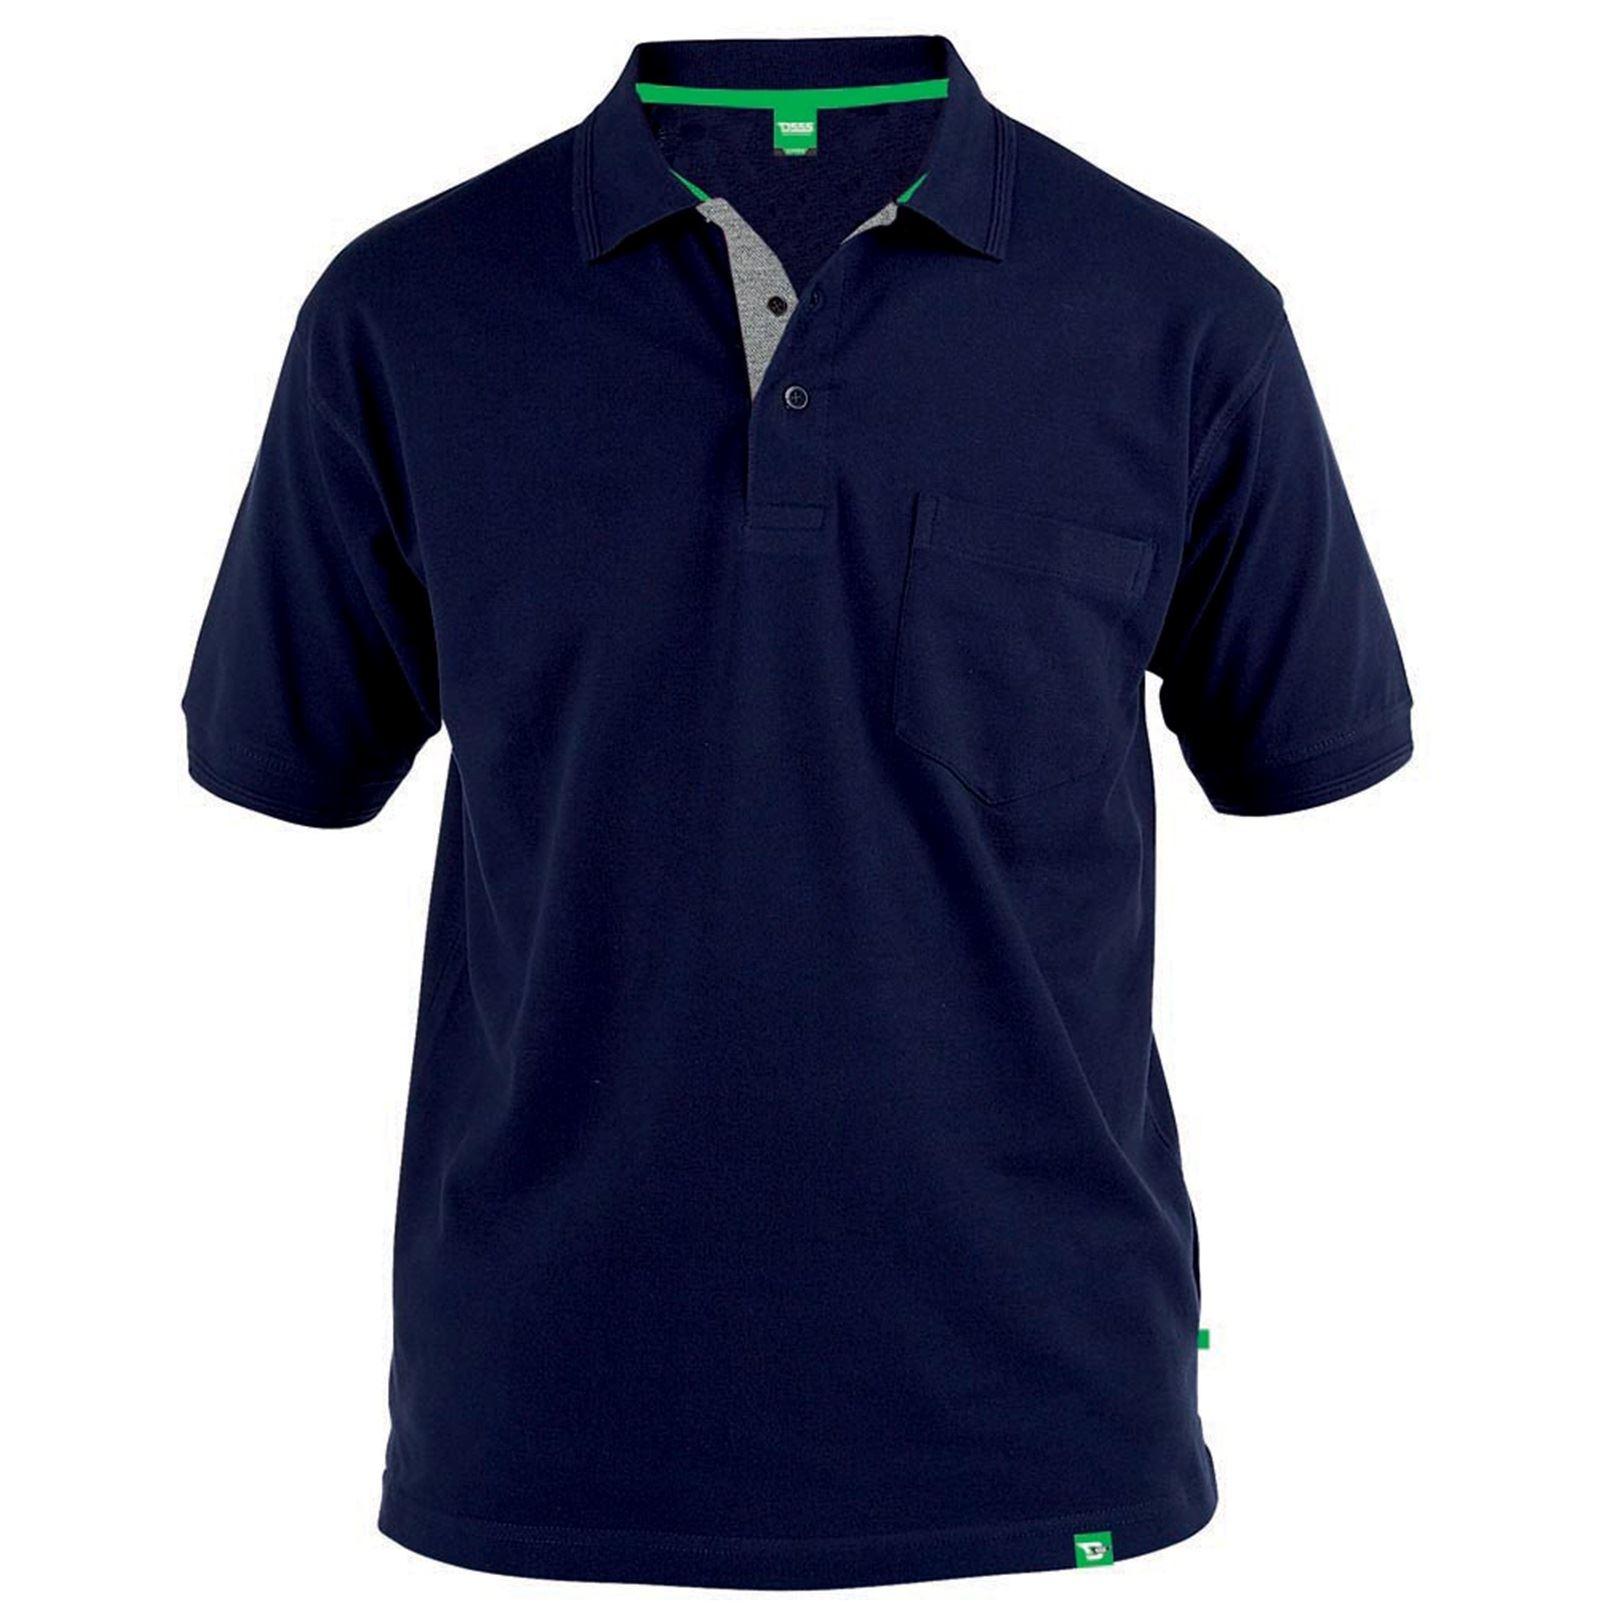 5f1d9b16a Duke D555 Mens Grant Big Tall King Plus Size Short Sleeve Pique Polo Shirt  Top